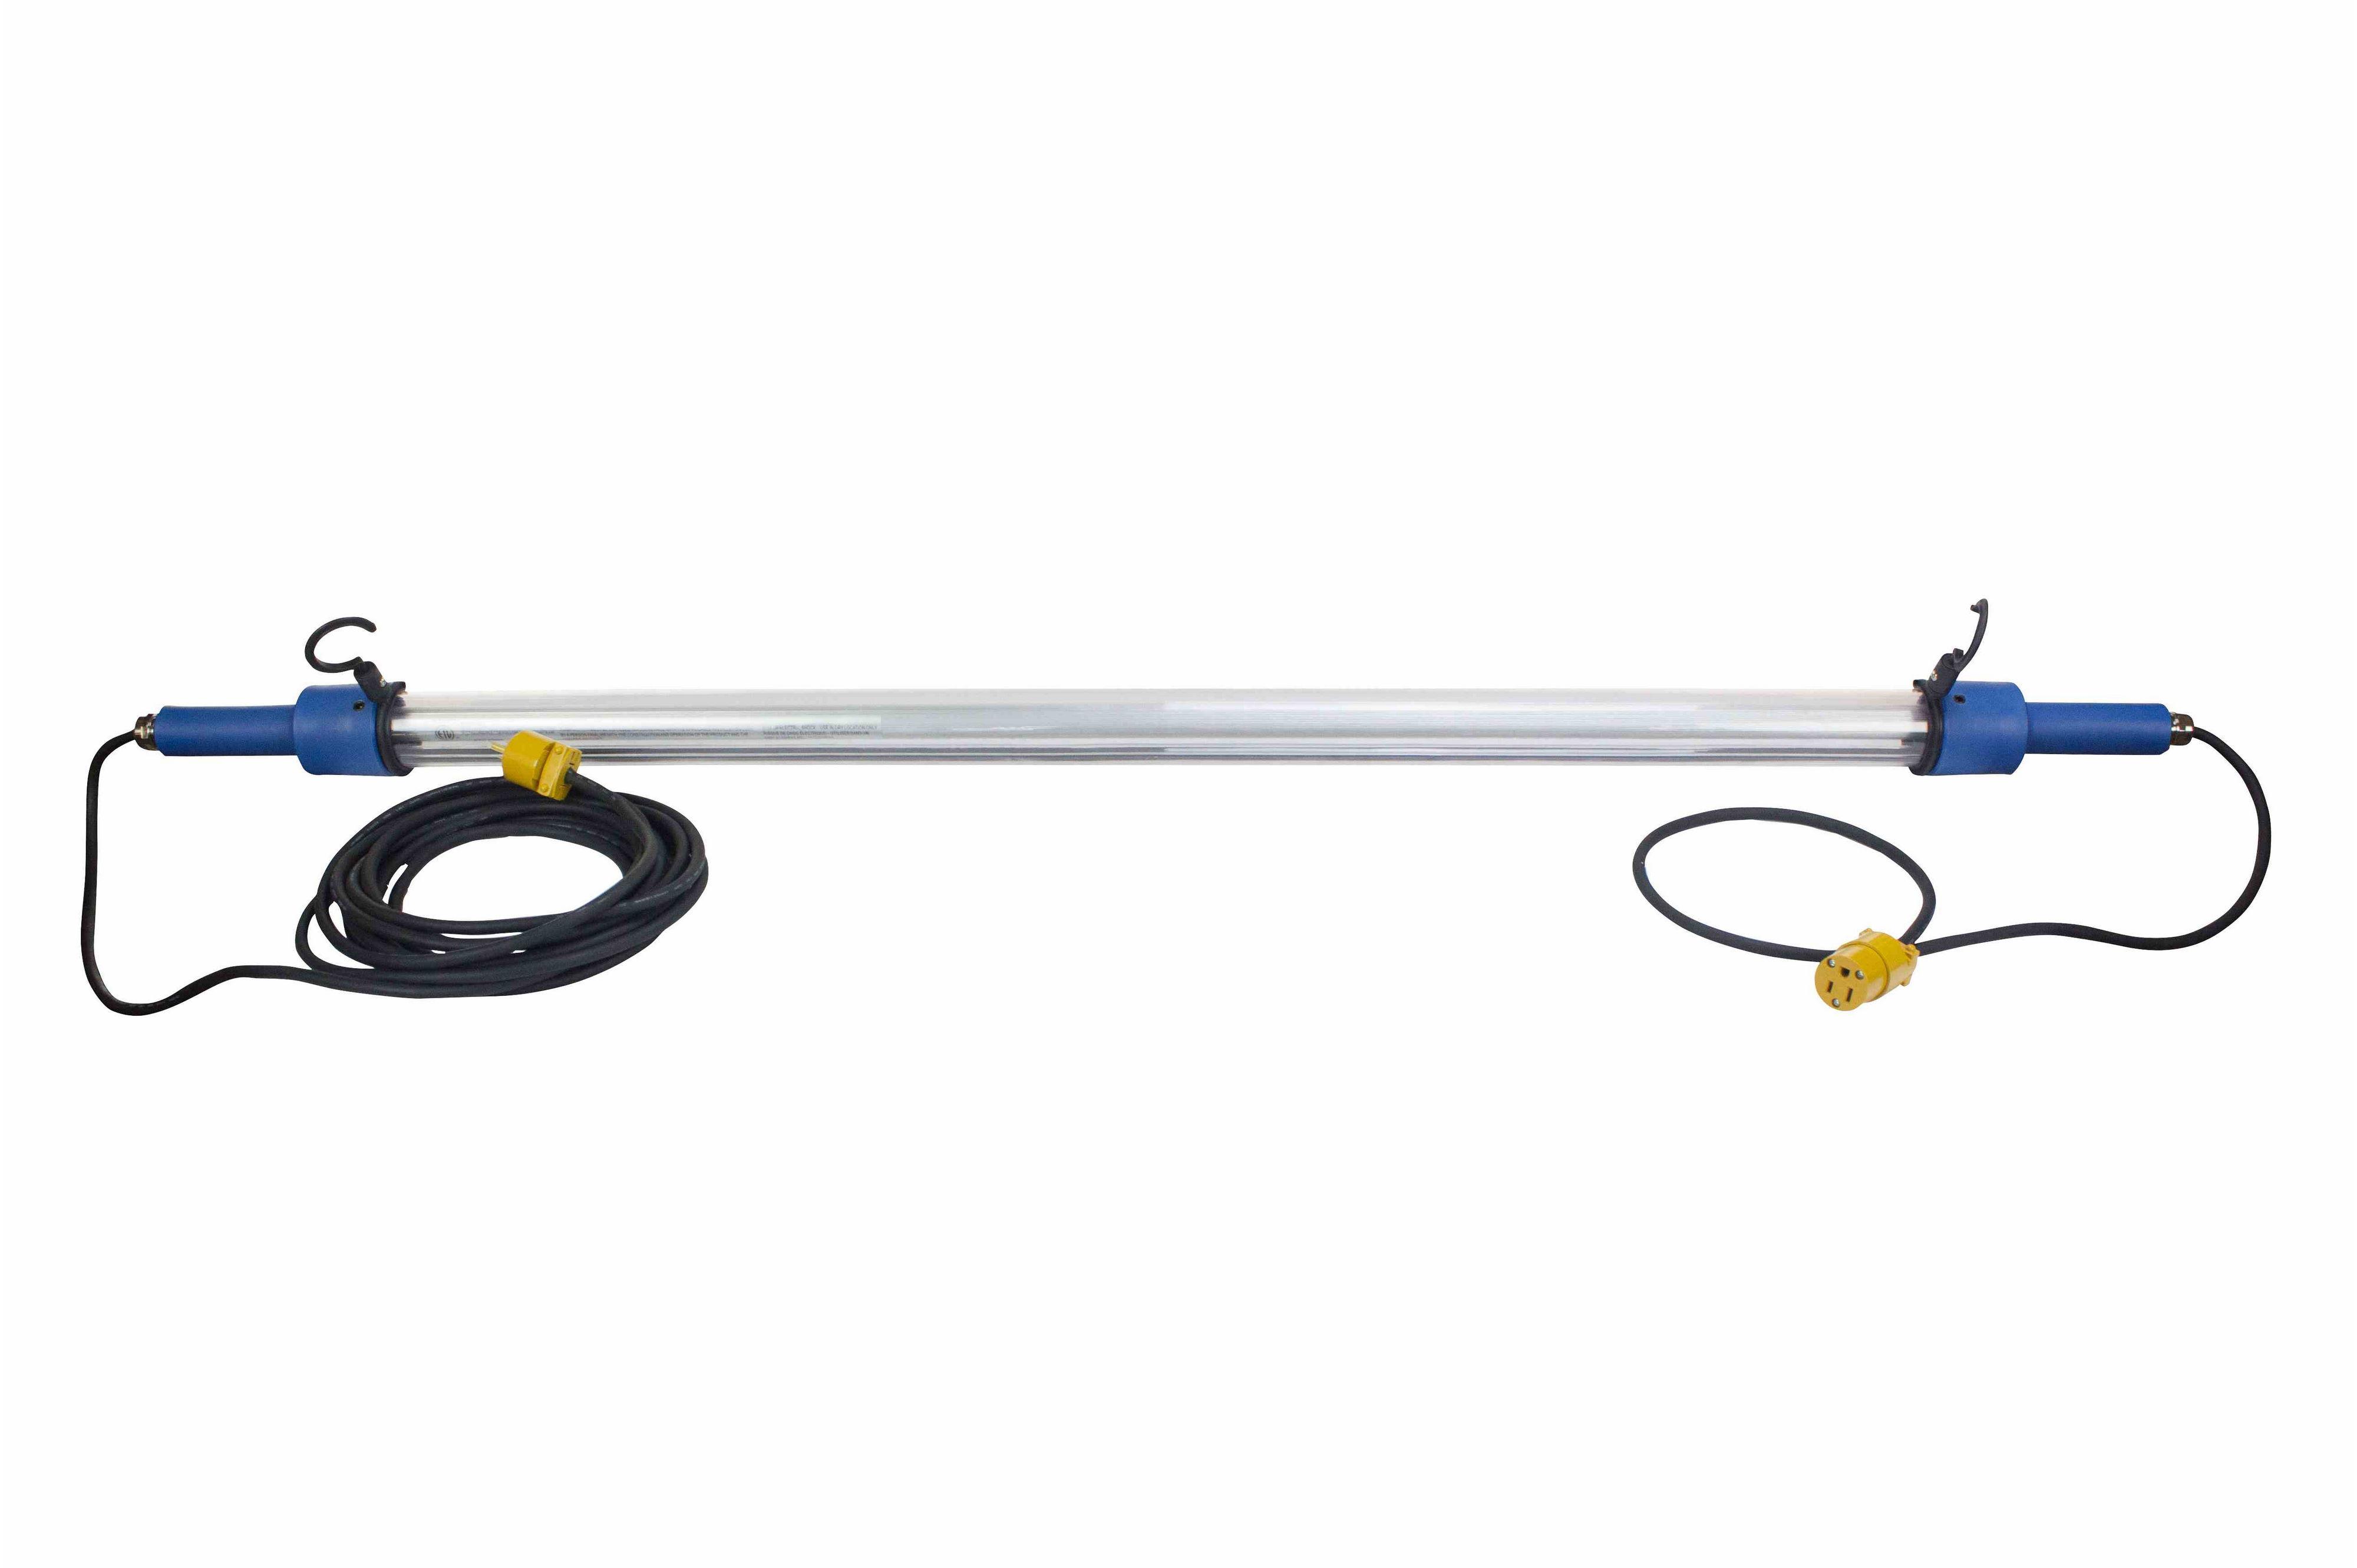 28w led drop light  task light - 25 u0026 39  cord - inline switch - 5 u0026 39  tube